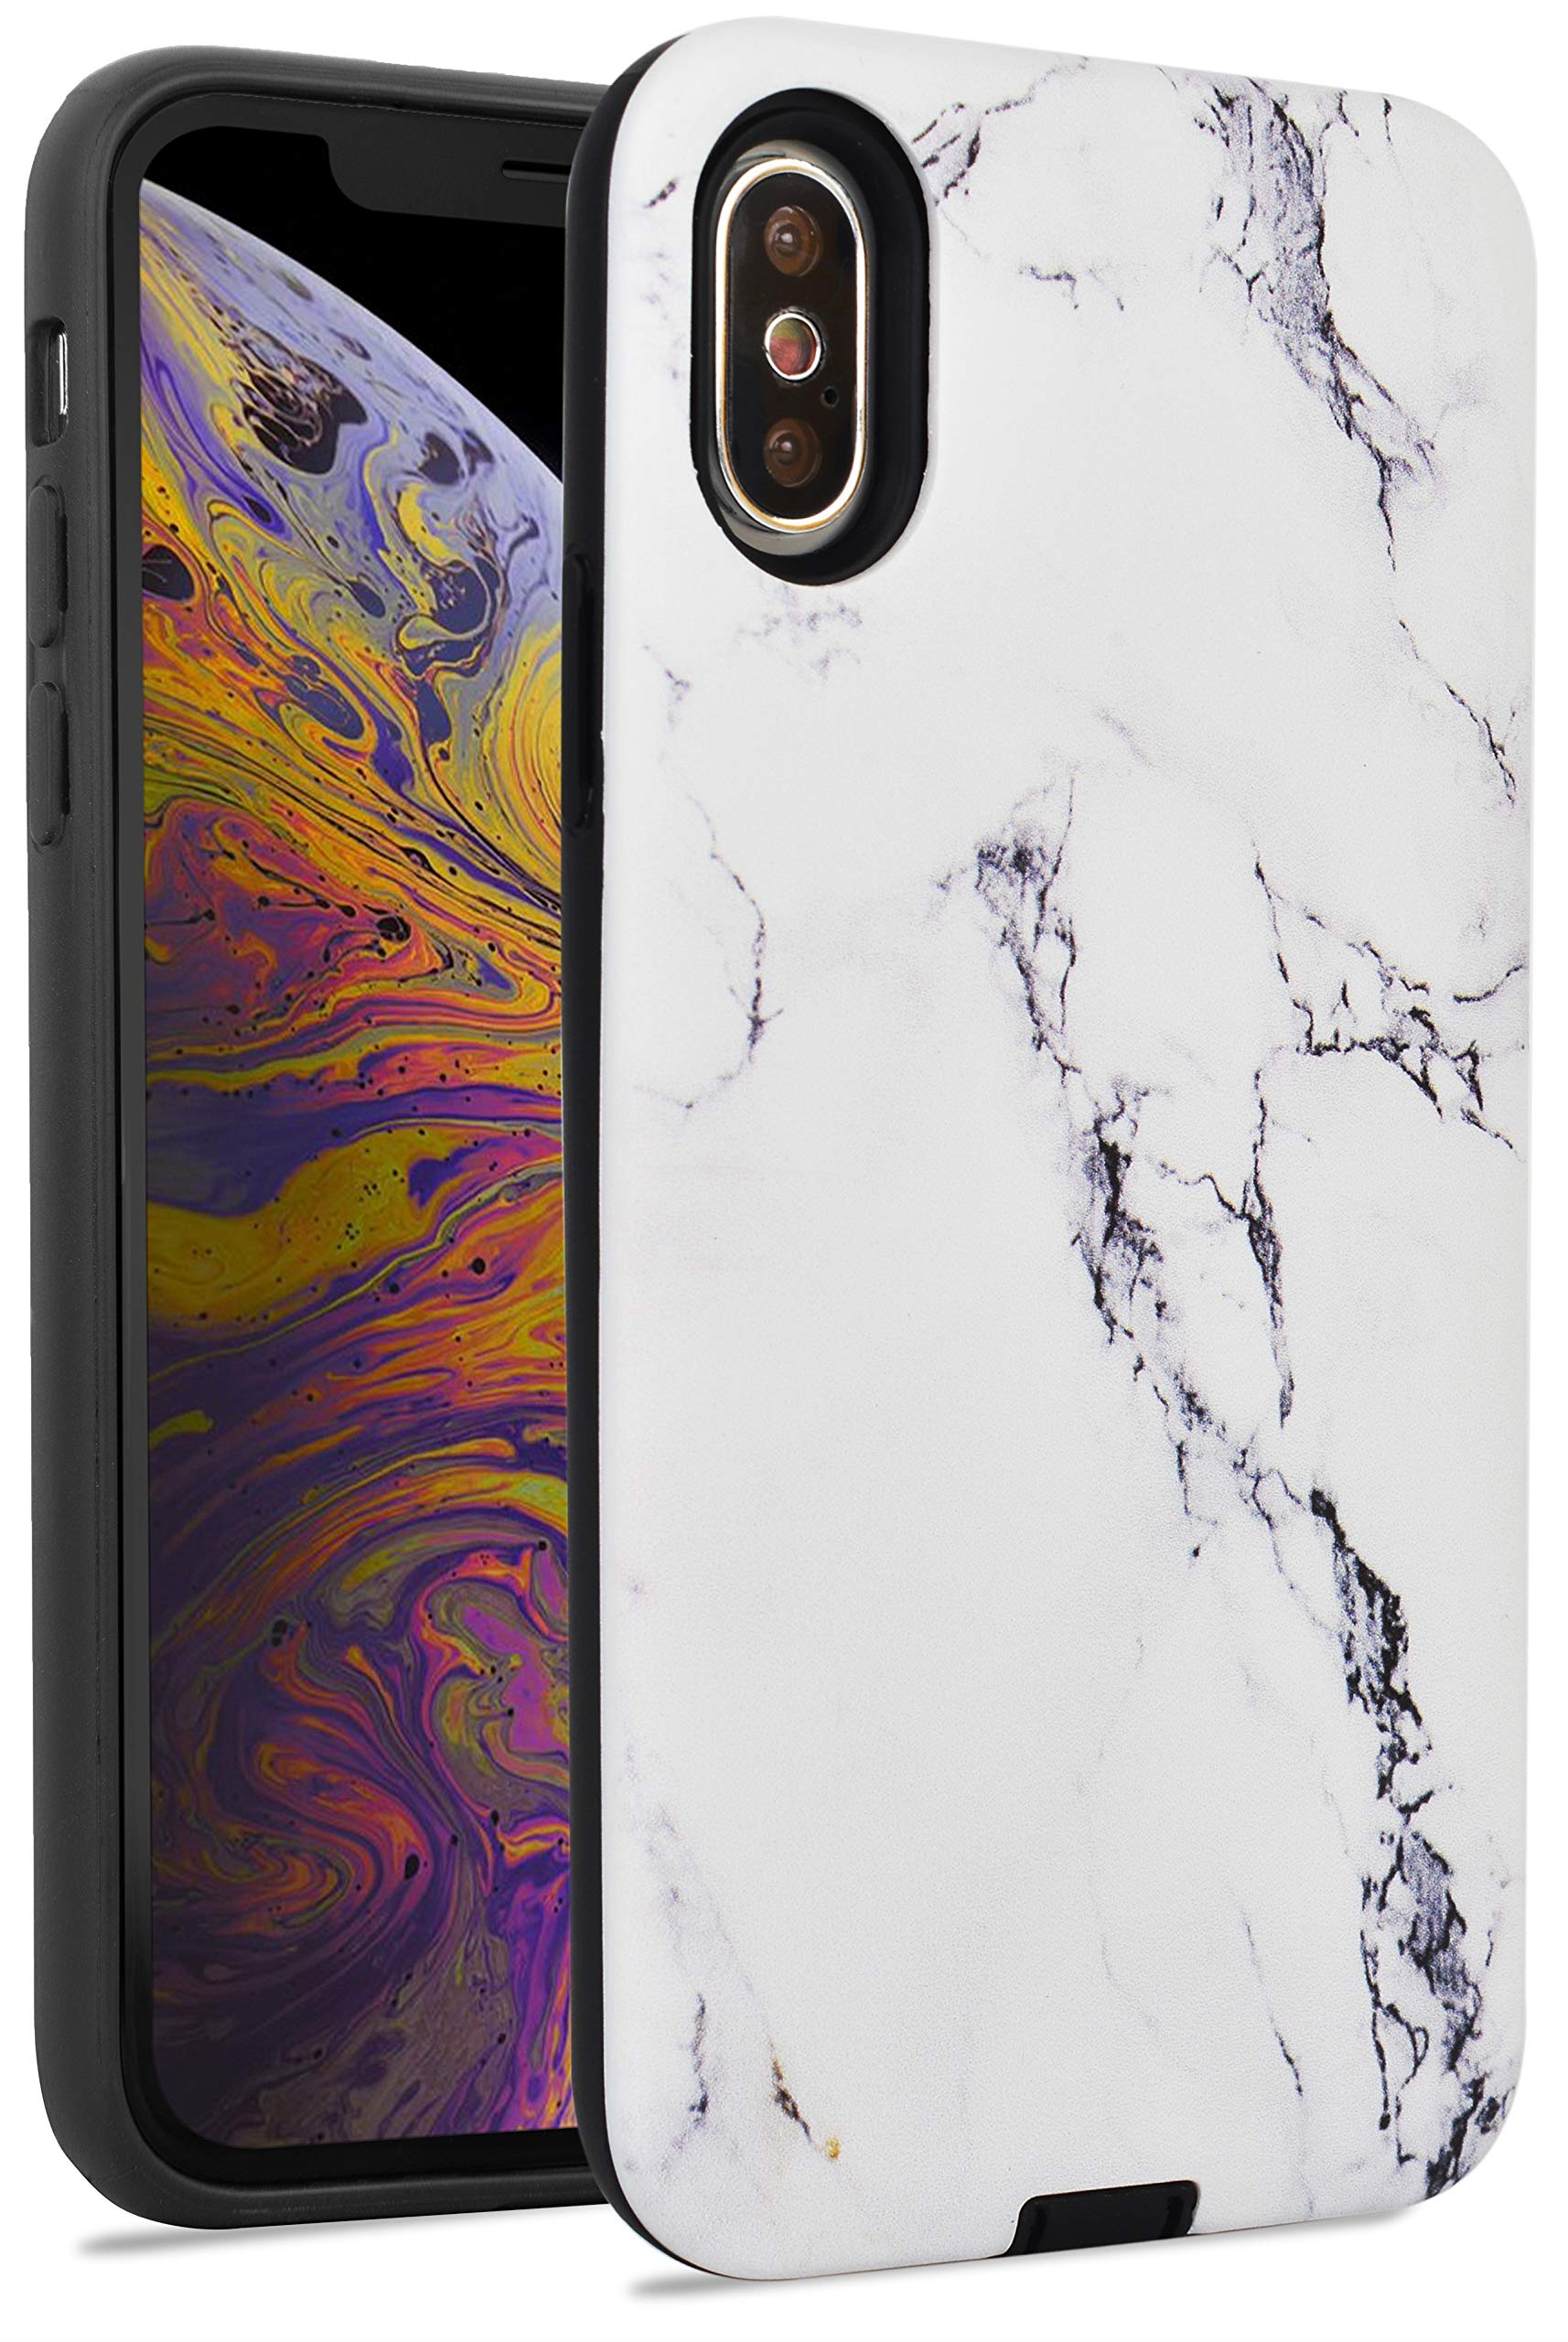 Funda Iphone 11 Pro Max LUVCASE [7WRCVWXD]